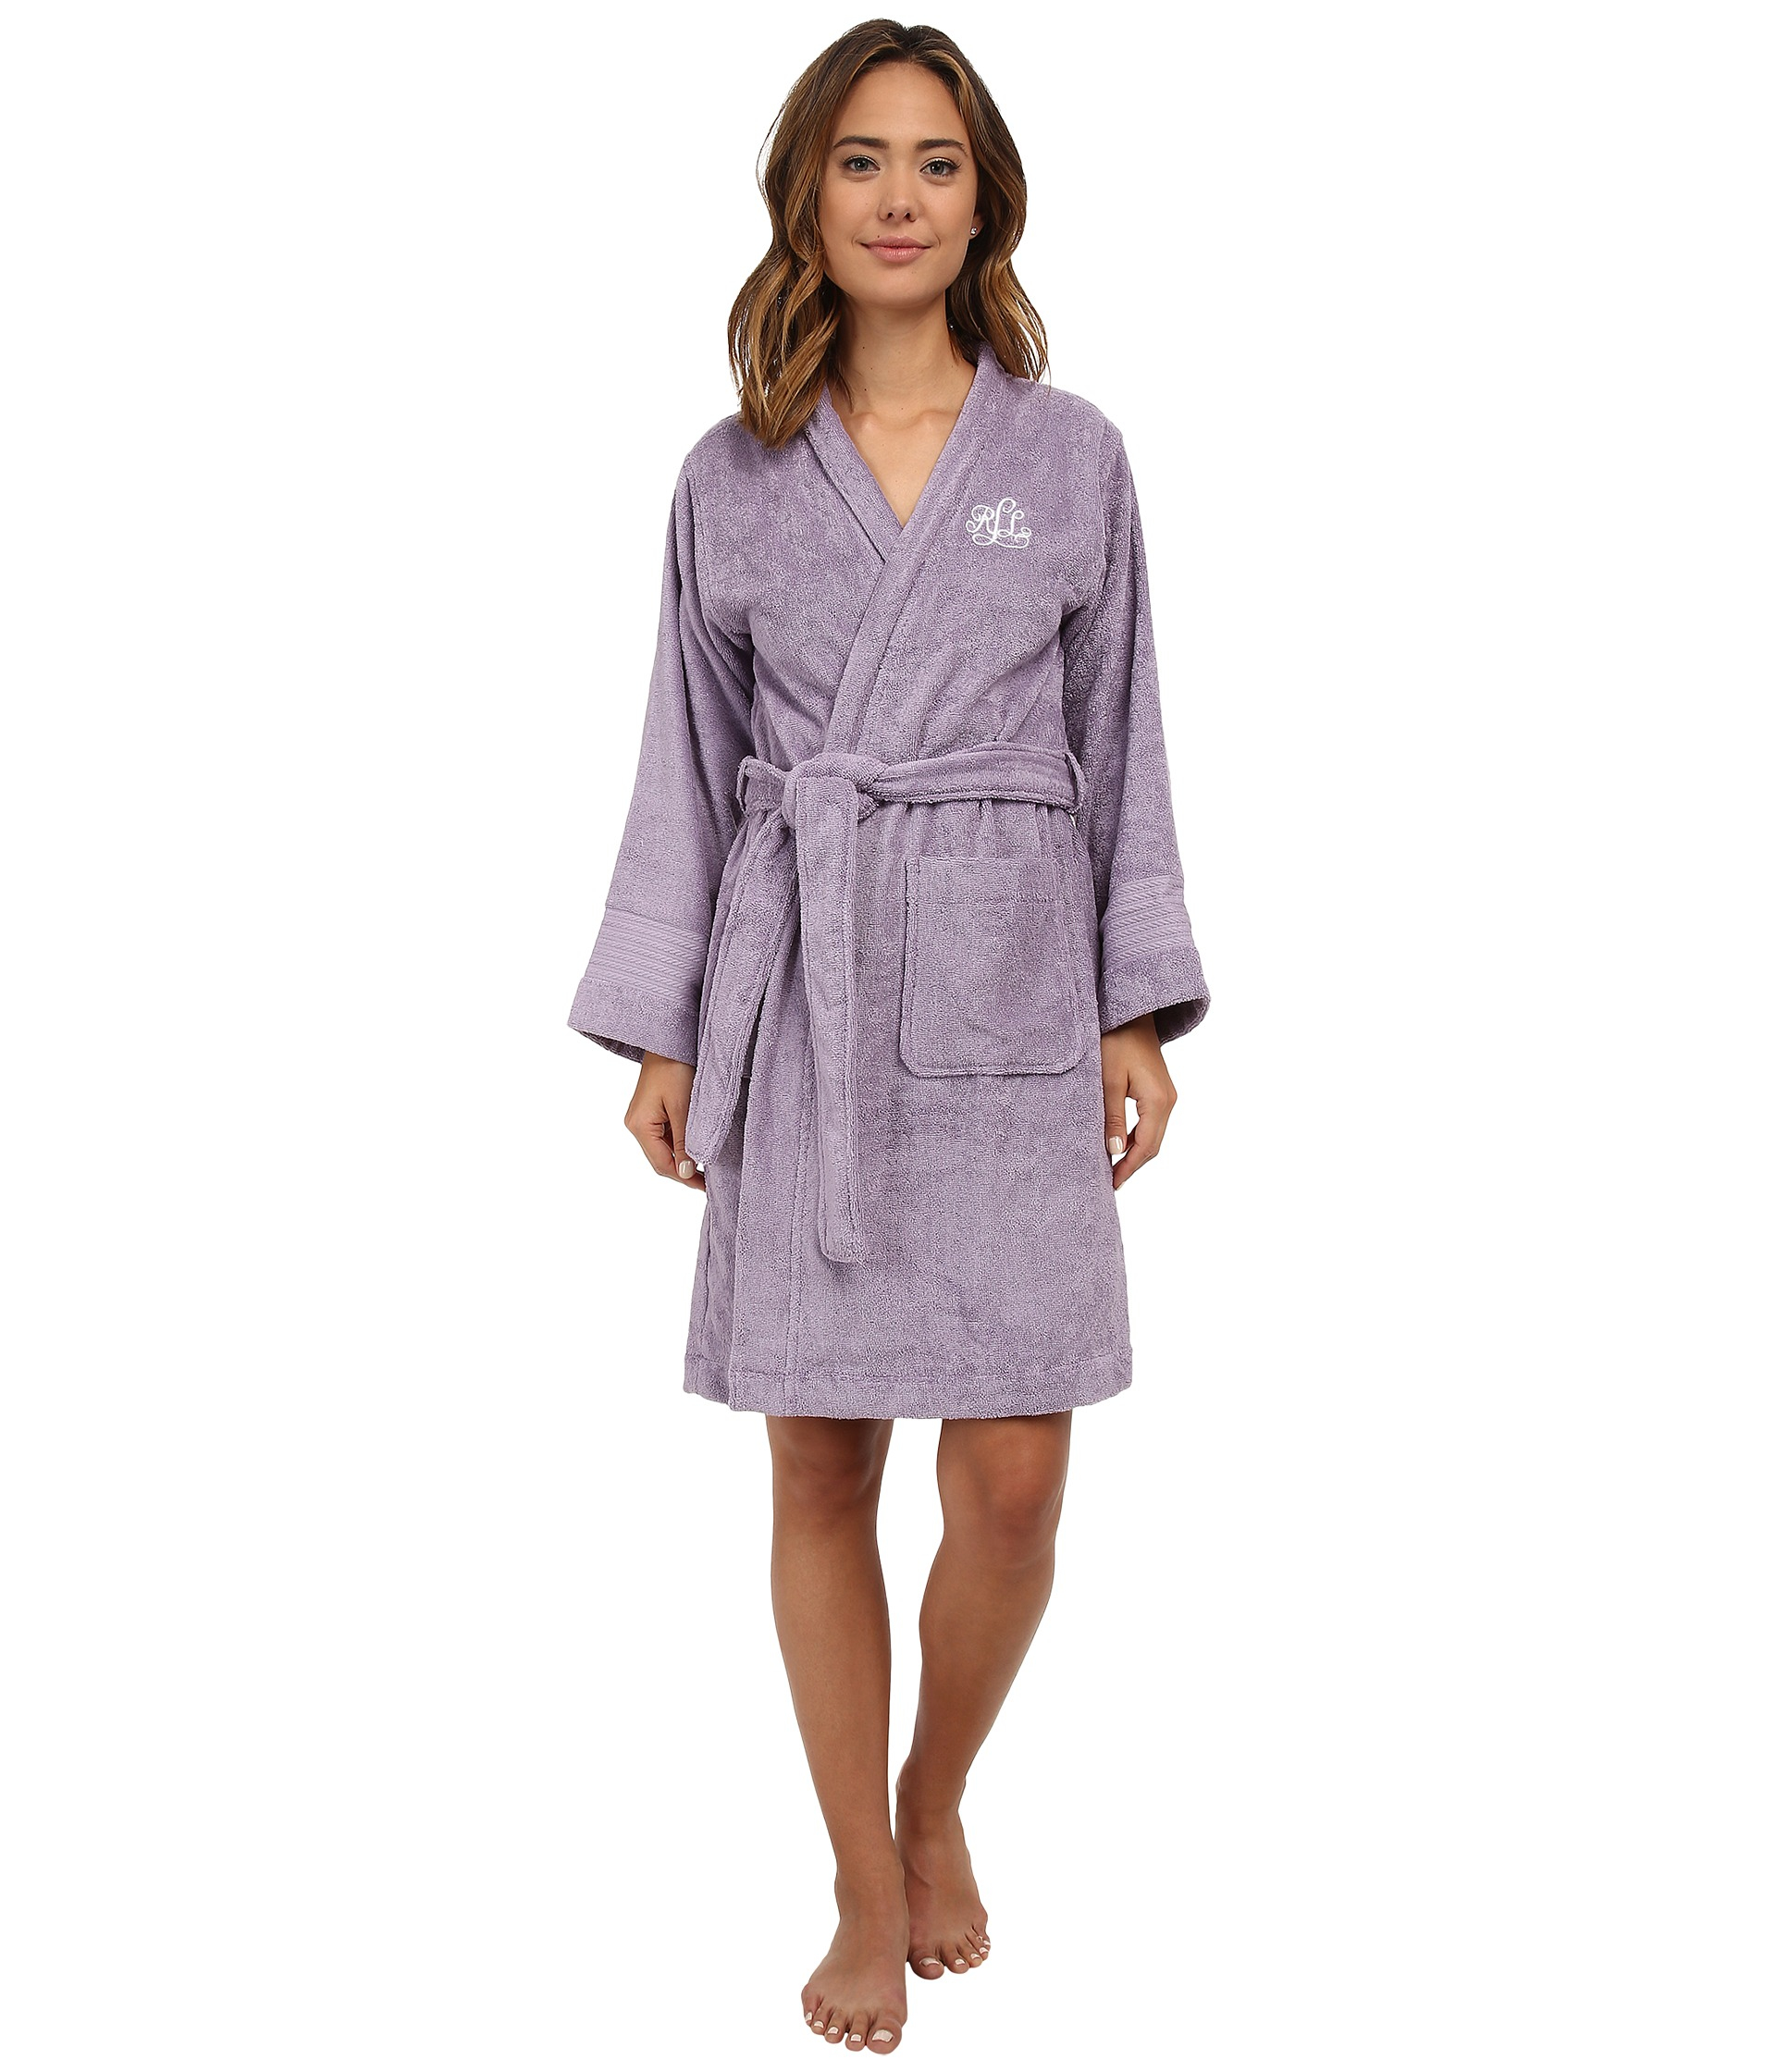 lauren by ralph lauren greenwich woven terry robe in purple wisteria lyst. Black Bedroom Furniture Sets. Home Design Ideas